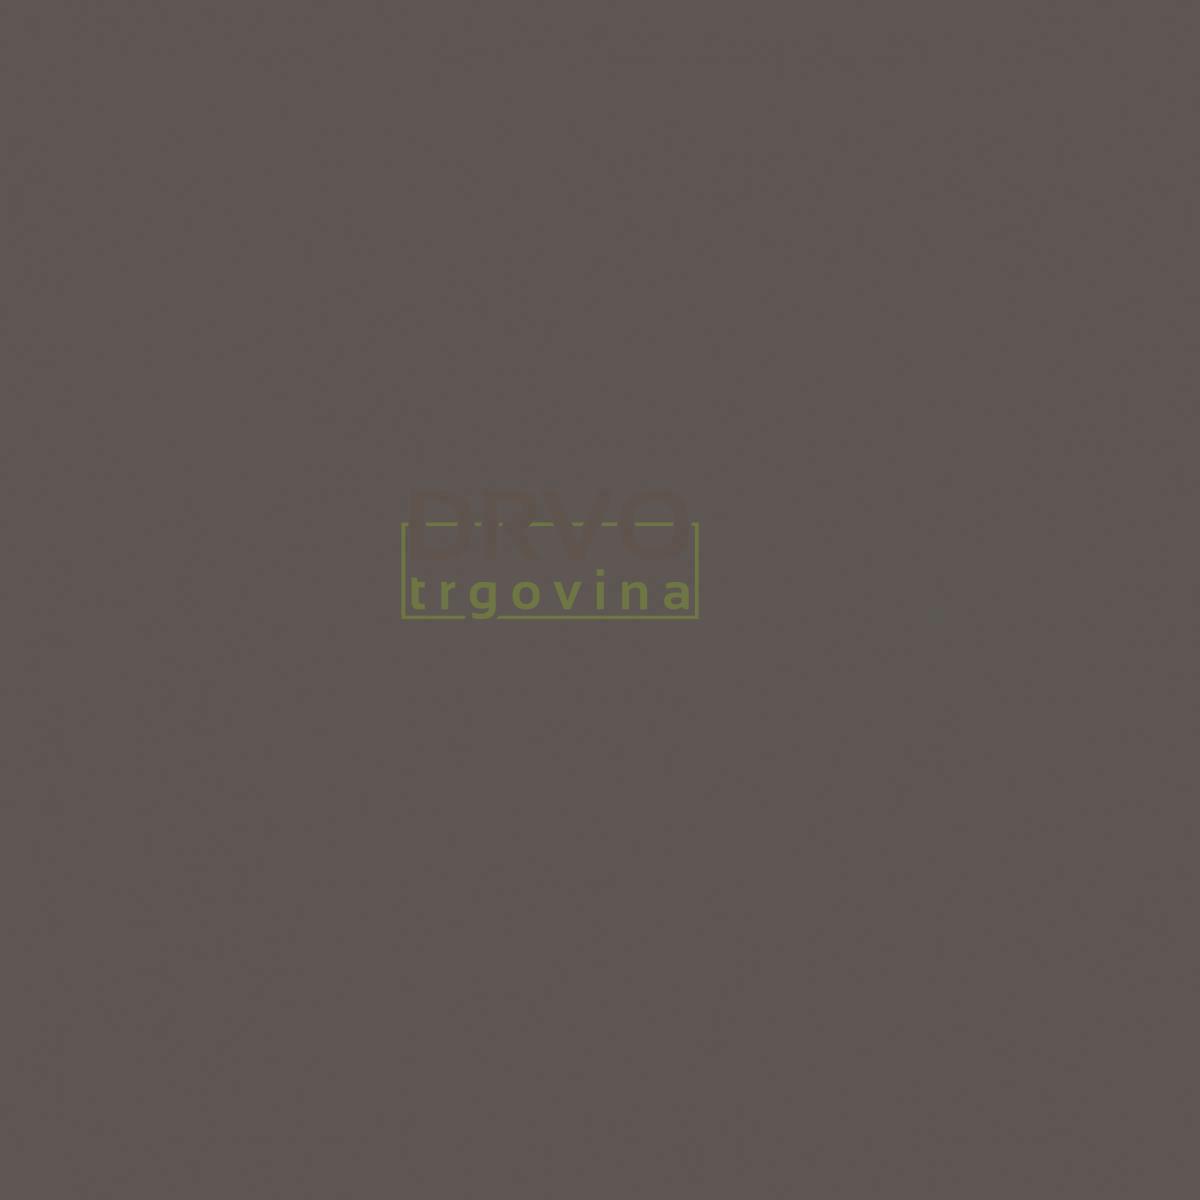 IVERICA OPLEMENJENA 6299 KOBALT SIVI BS 18mm 2800/2070